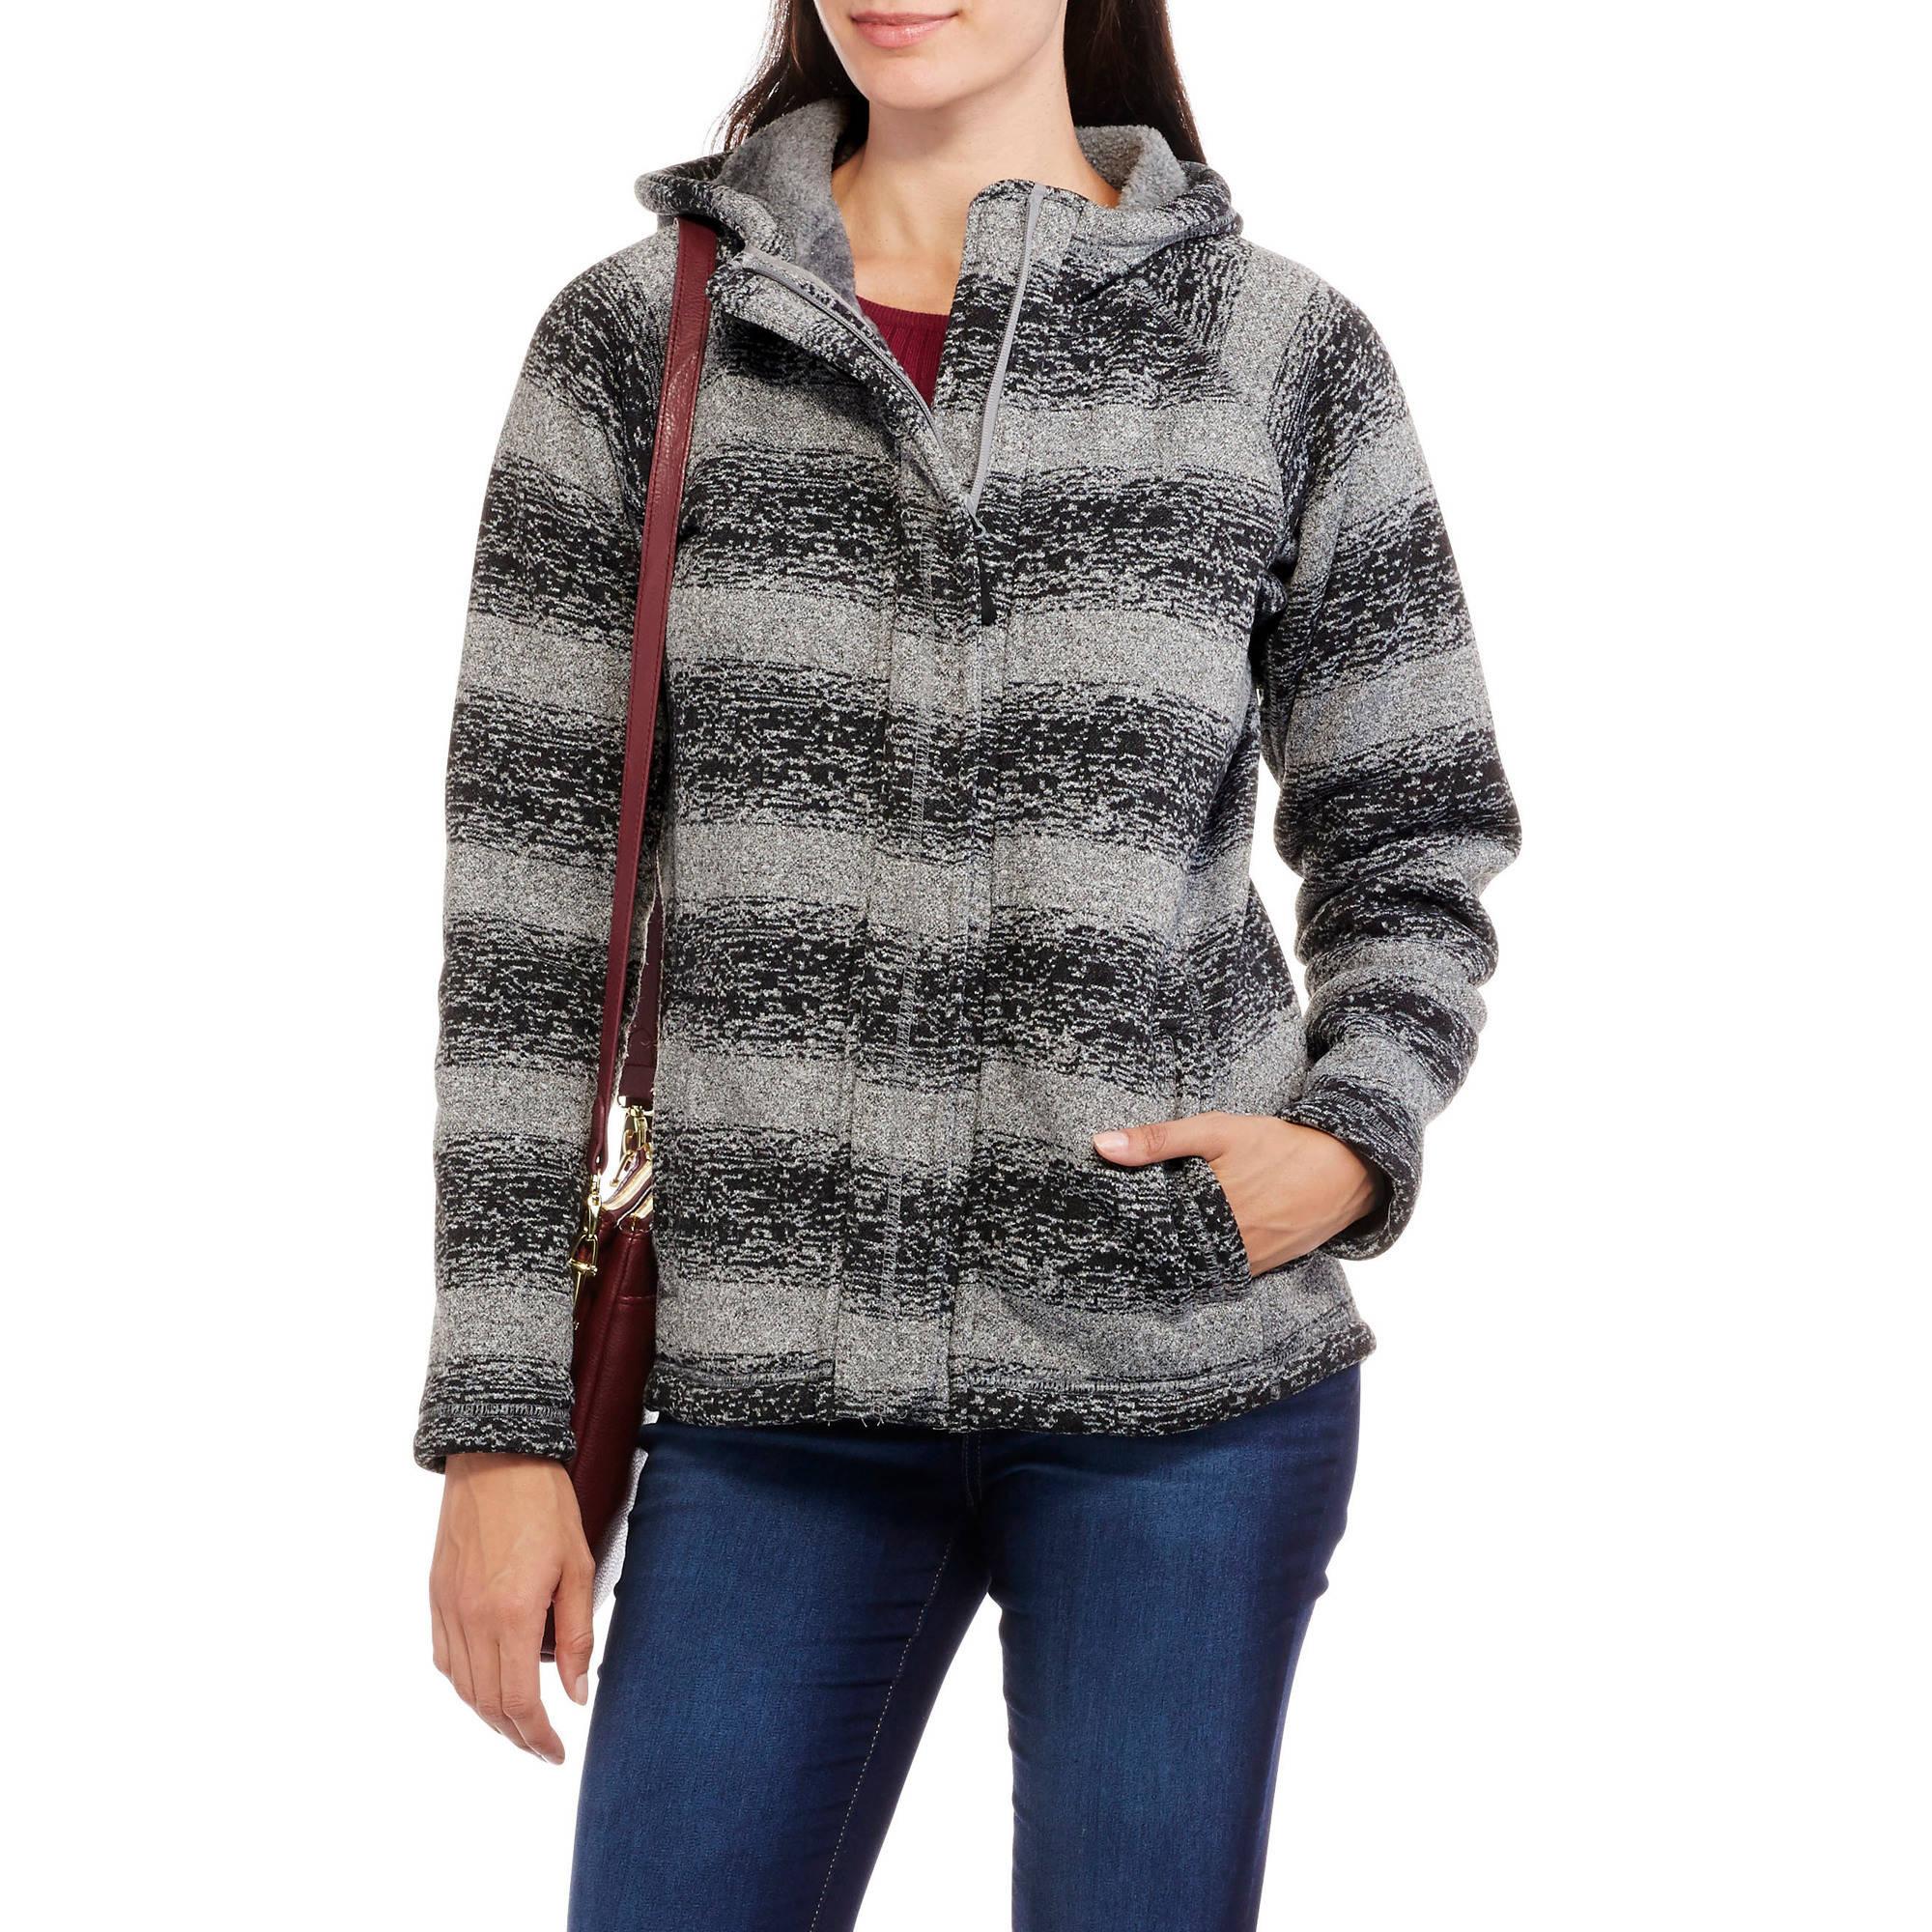 Iceburg Women's Snowboarding Sweater Fleece Hoodie